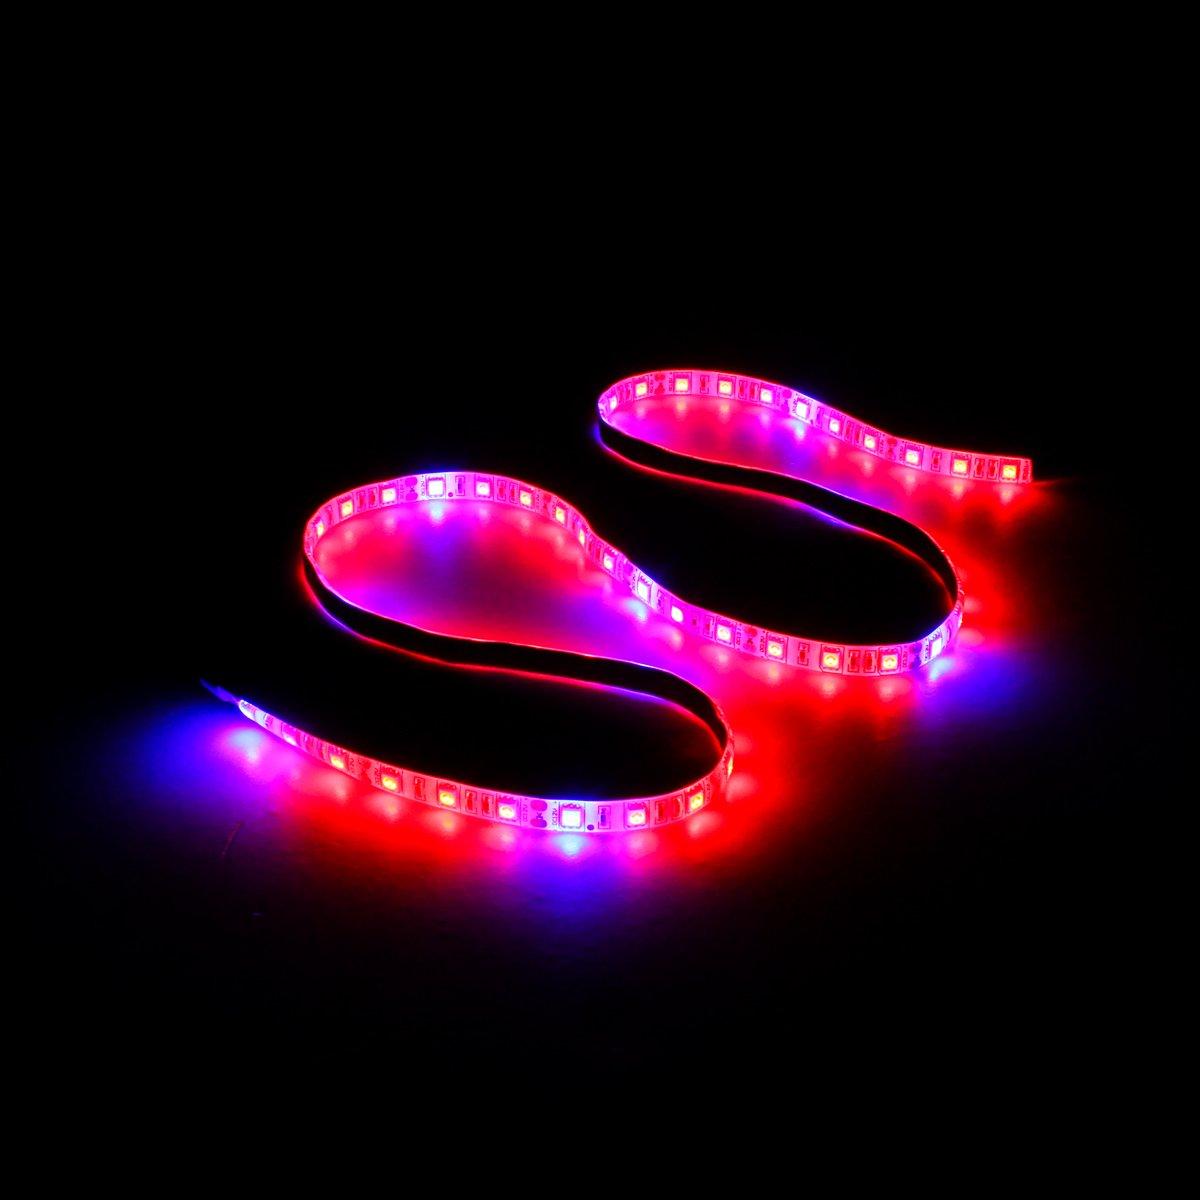 1 Striscia LED Full Spectrum Grow Grow Light ERCZYO 2M Blu 4 1M 4M 5M 5050SMD Rosso Impermeabile Size : Length 0.5M ERCZYO DC12V 0.5M 3M